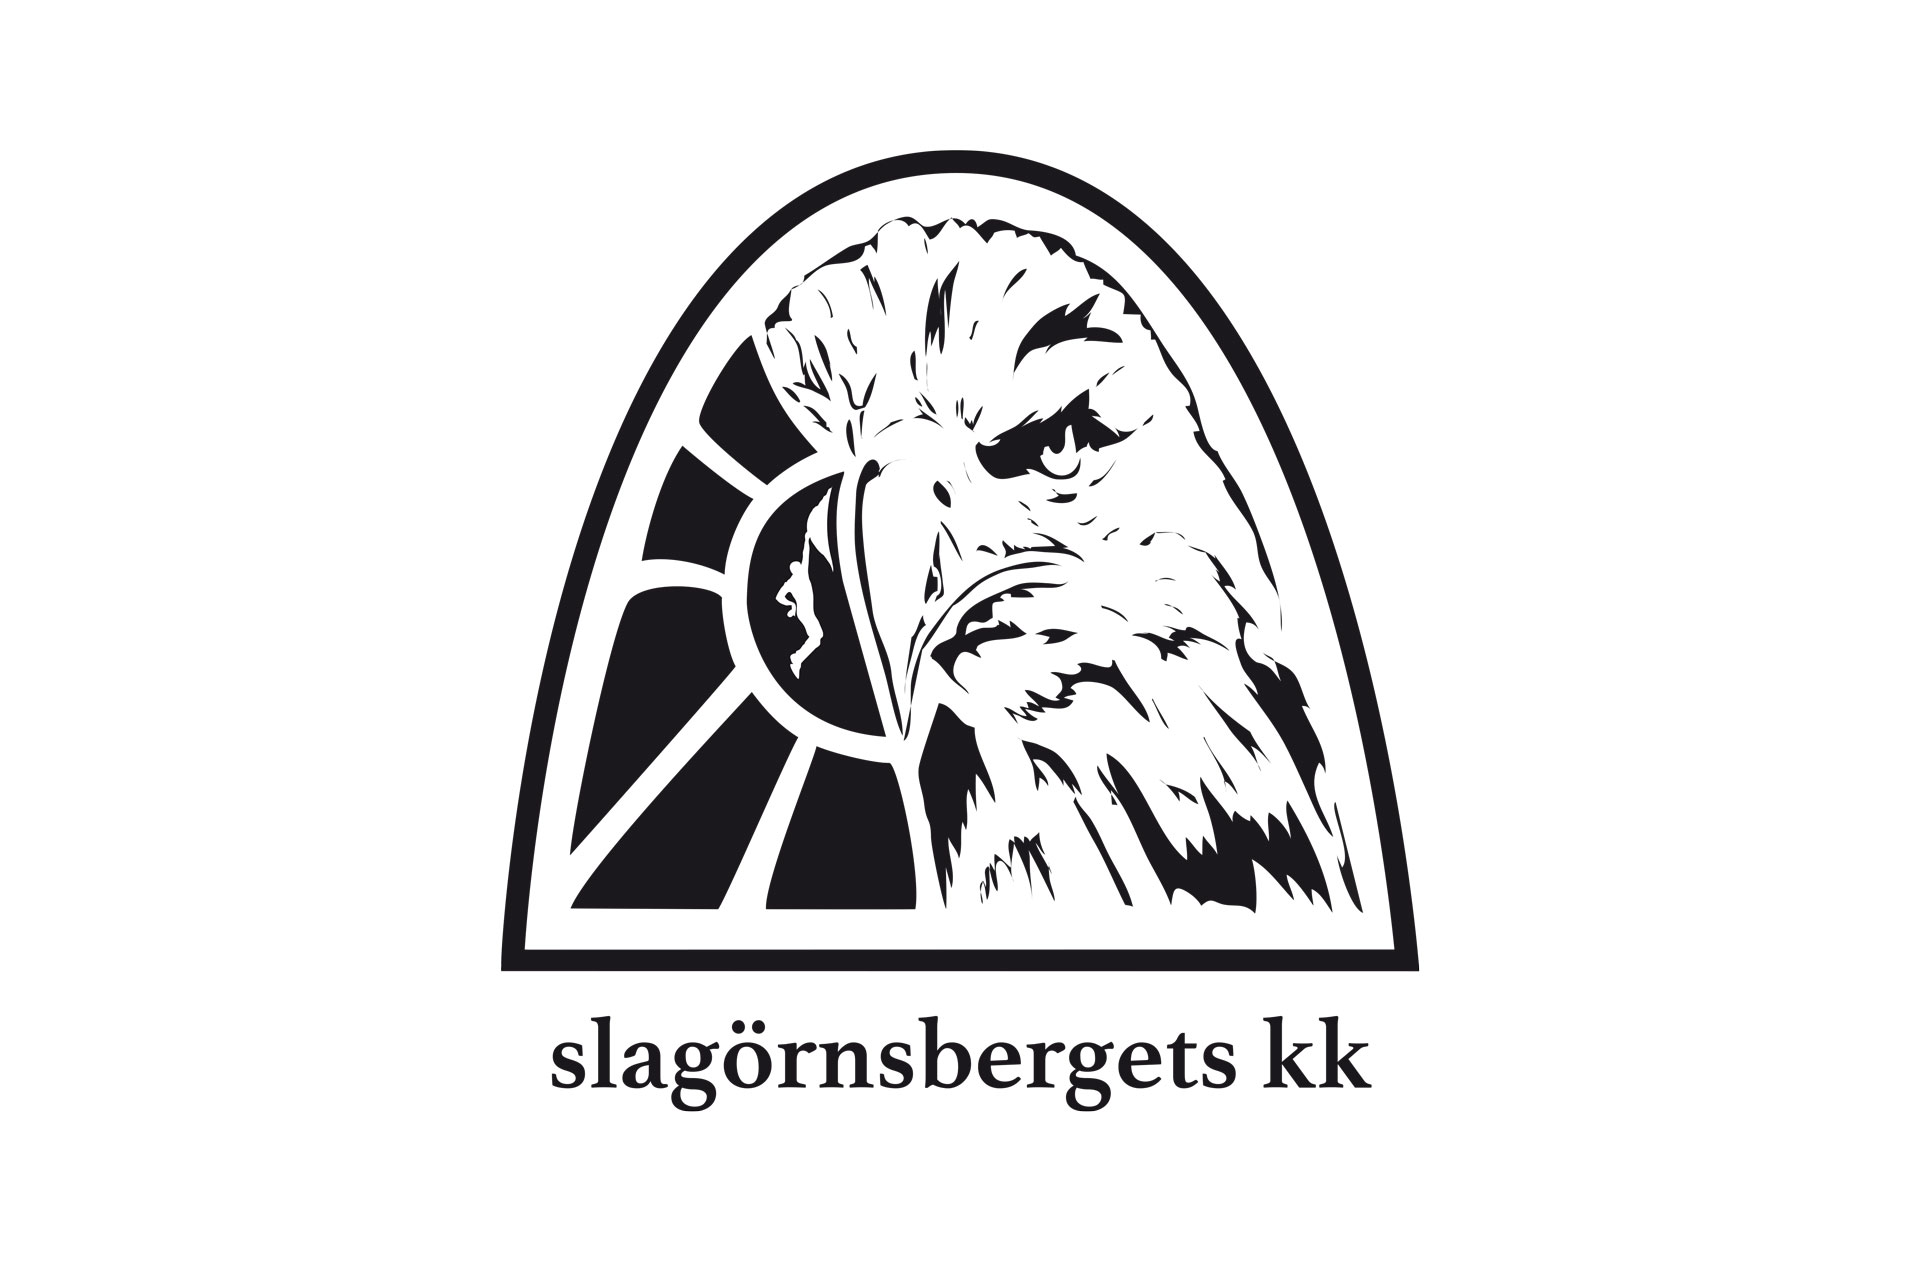 Jangenfalk & Lundevall, Slagörnsbergets KK